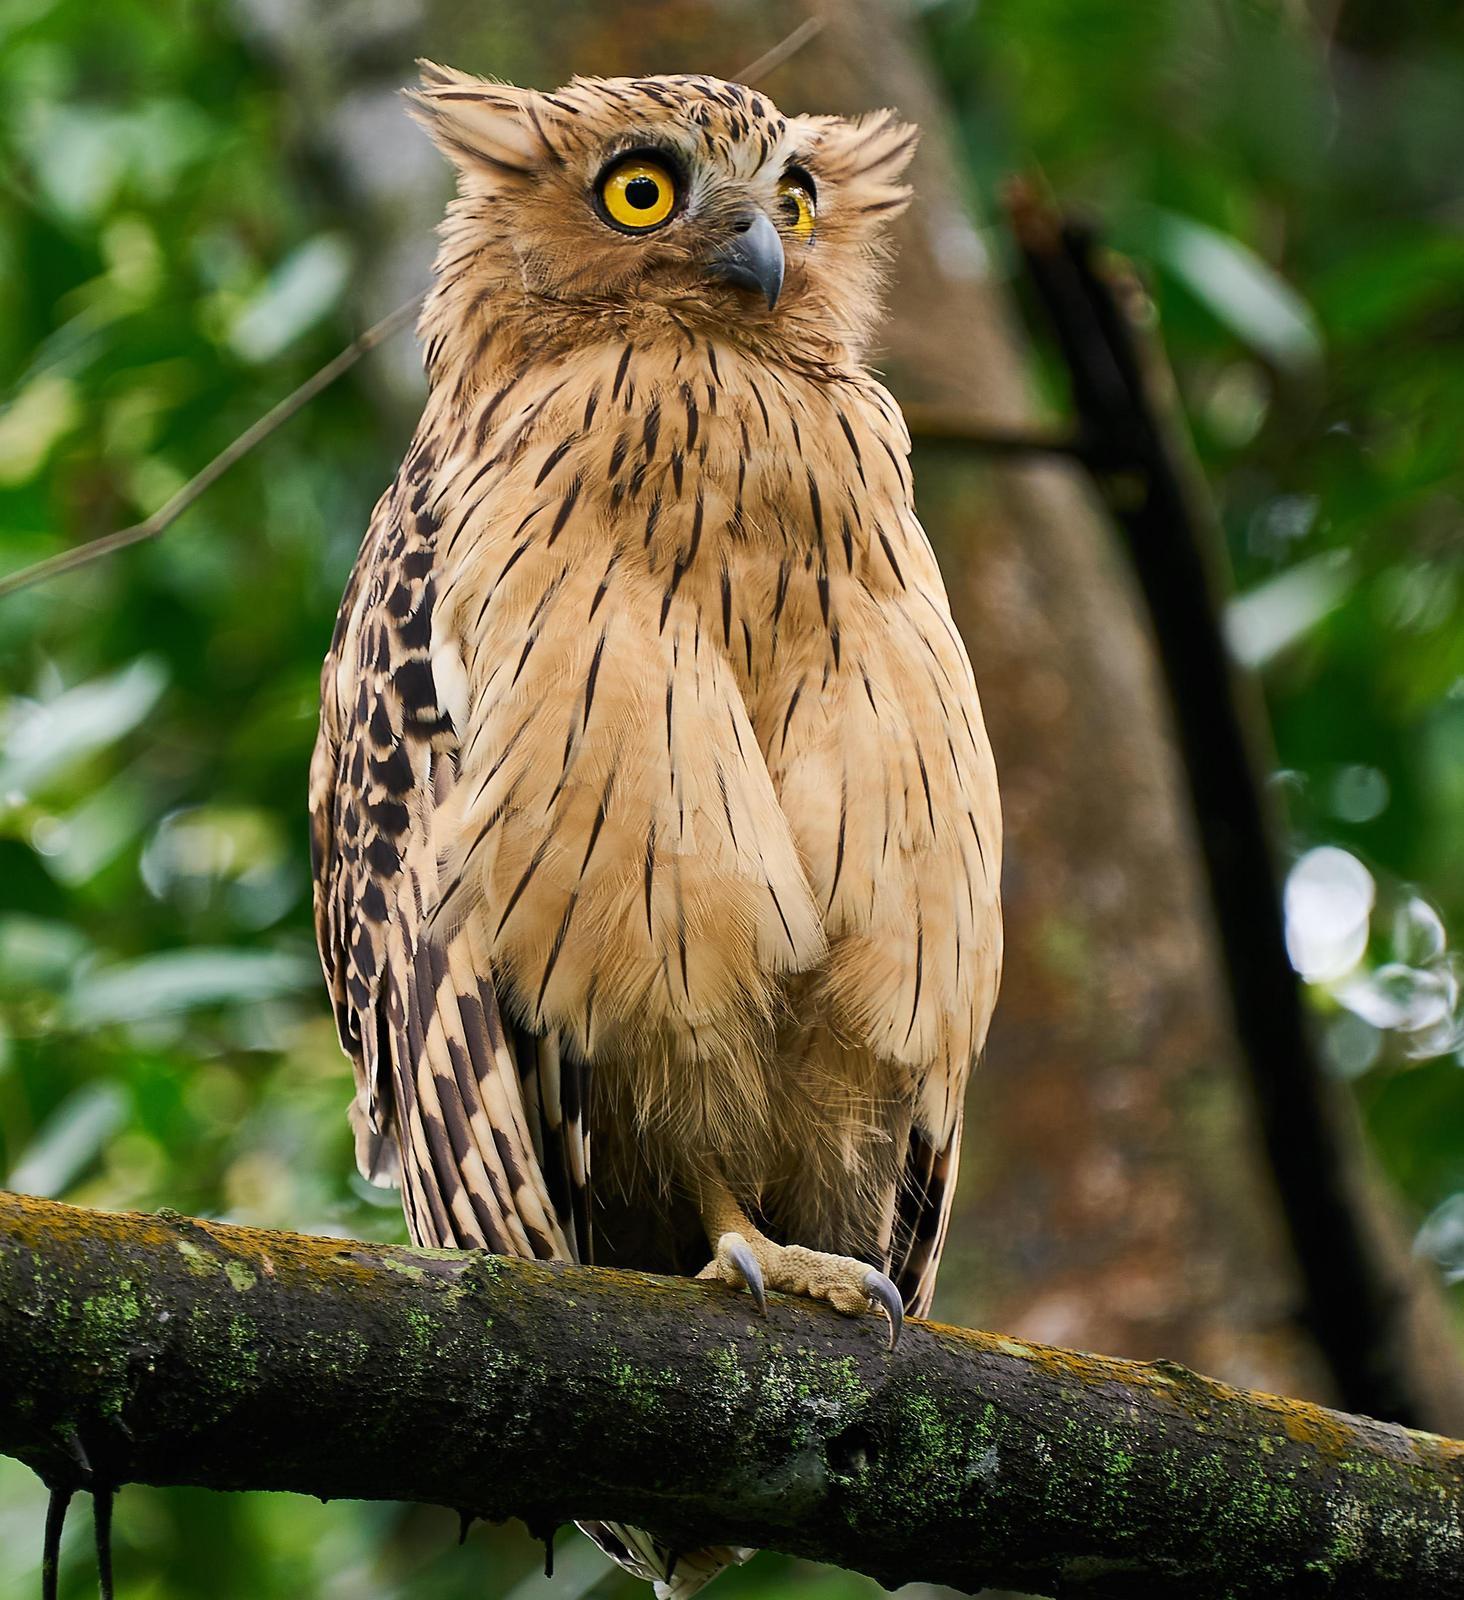 Buffy Fish-Owl Photo by Steven Cheong